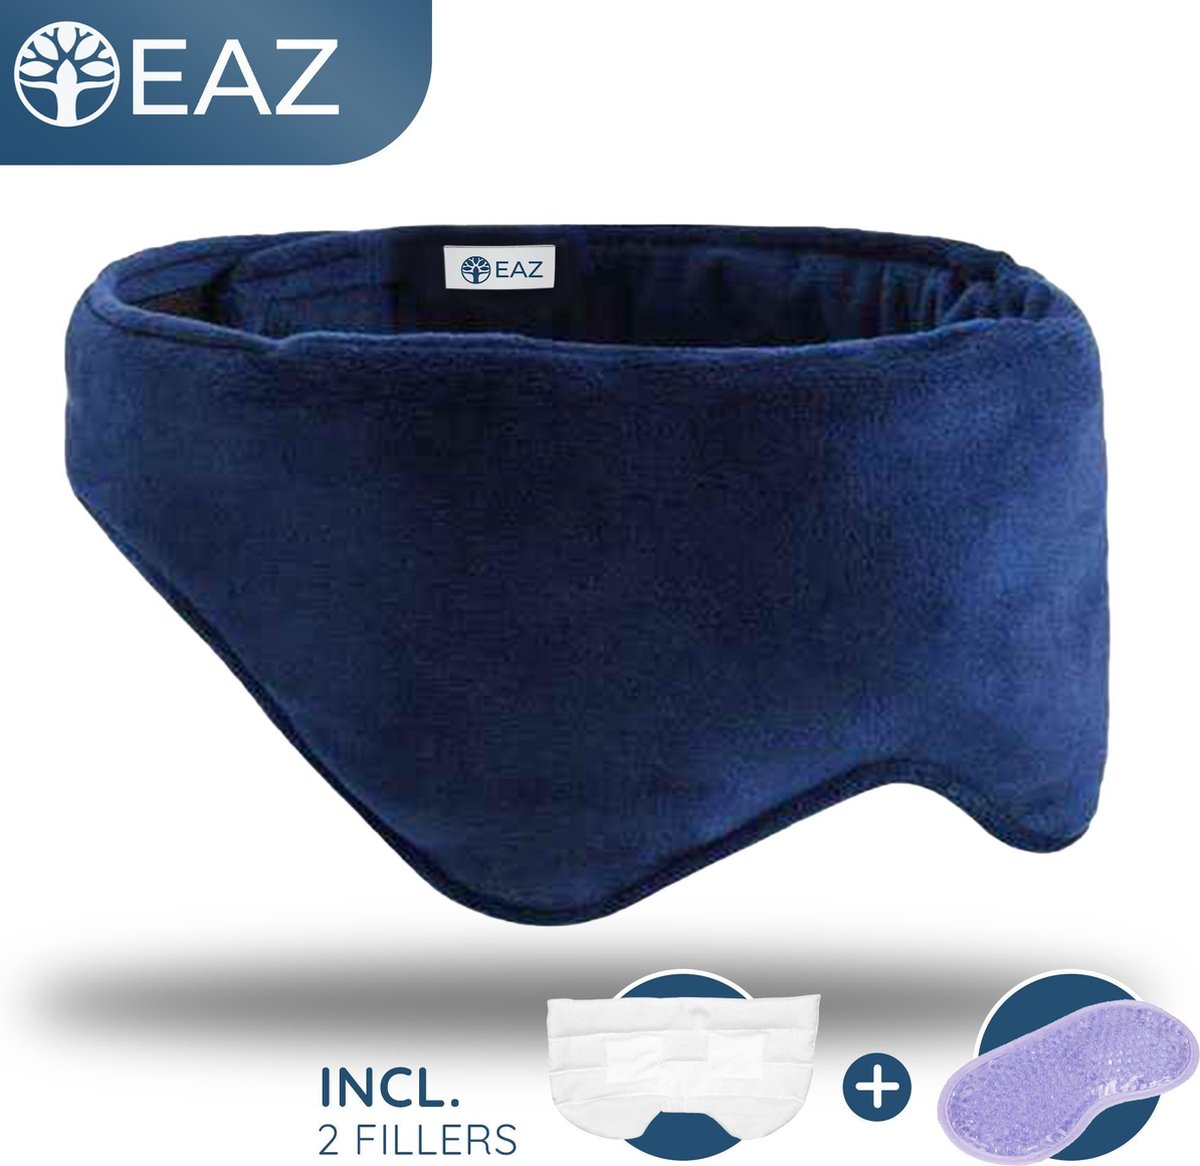 EAZ® Verzwaard Slaapmasker Incl. Koelfiller en Bewaarhoes - Verwarmd Oogmasker - Relax - Migraine -